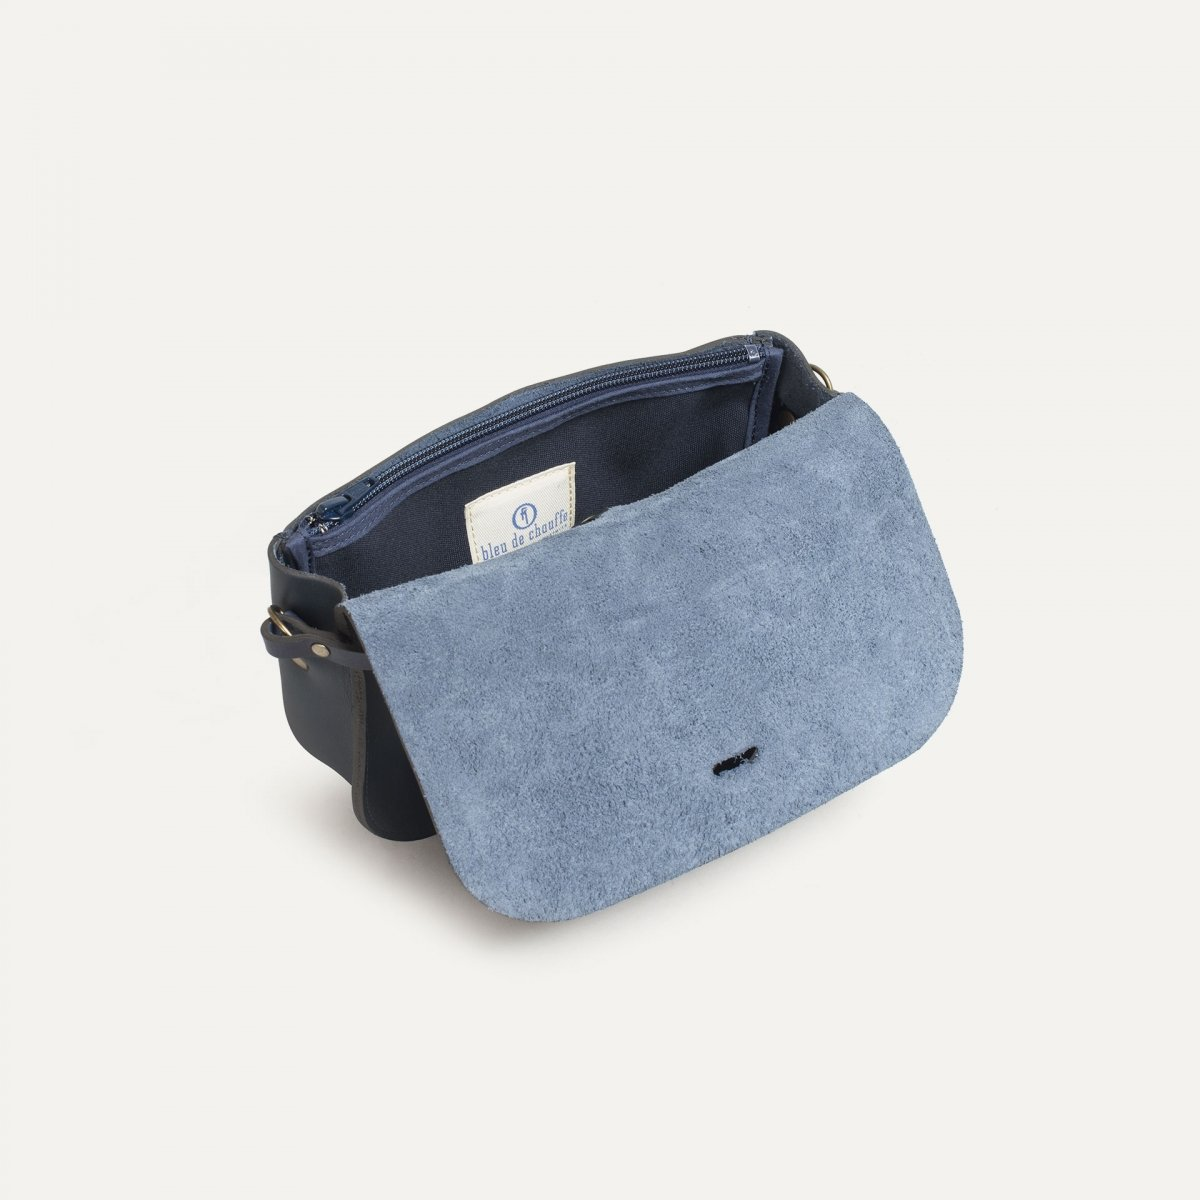 Pastis handbag - Navy Blue (image n°4)